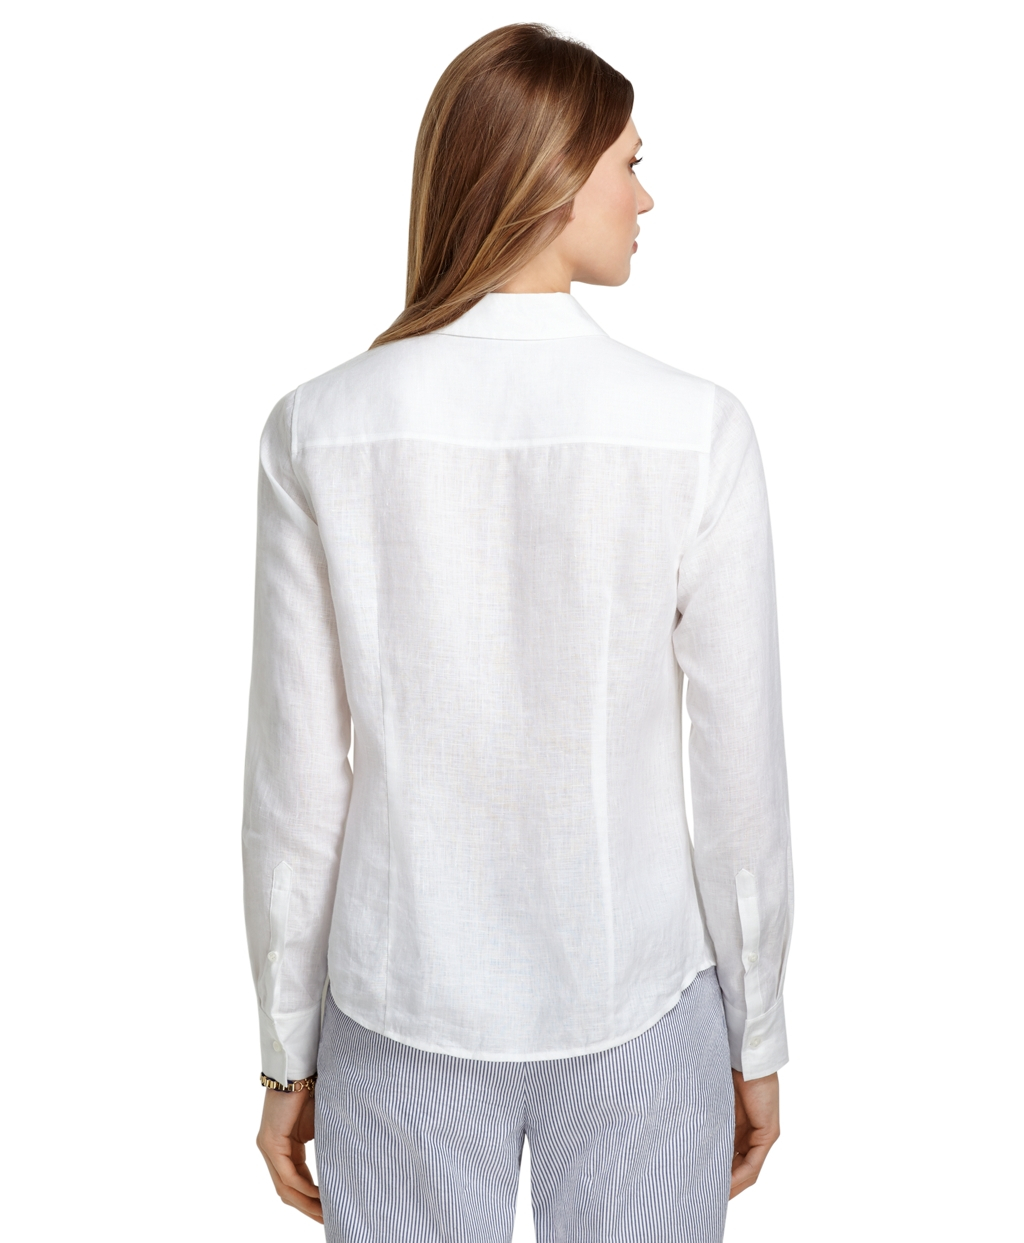 Brooks brothers petite fitted irish linen dress shirt in for Irish linen dress shirts